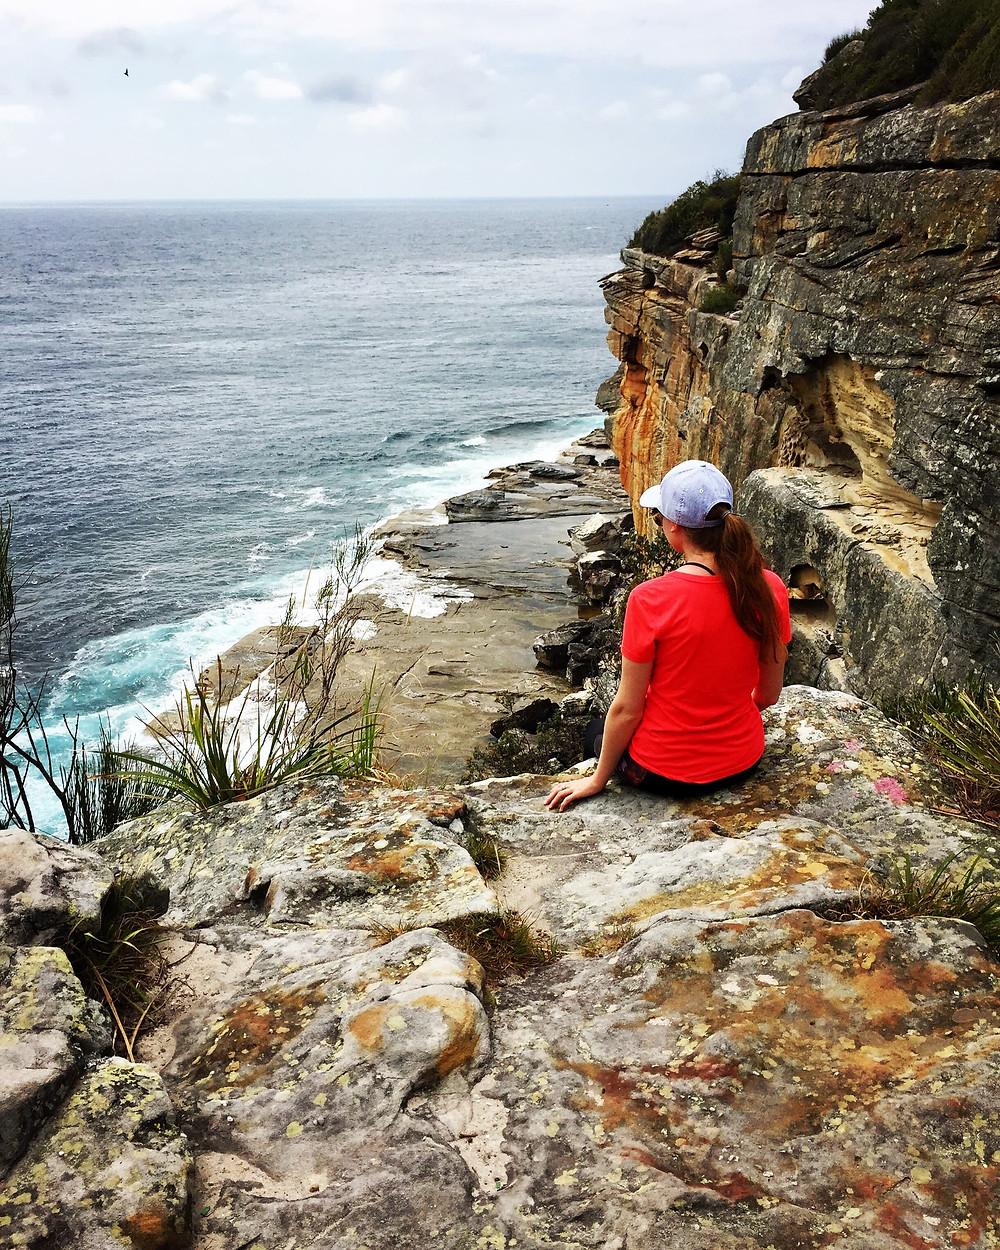 Girl sitting on cliff overlooking the ocean in Australia